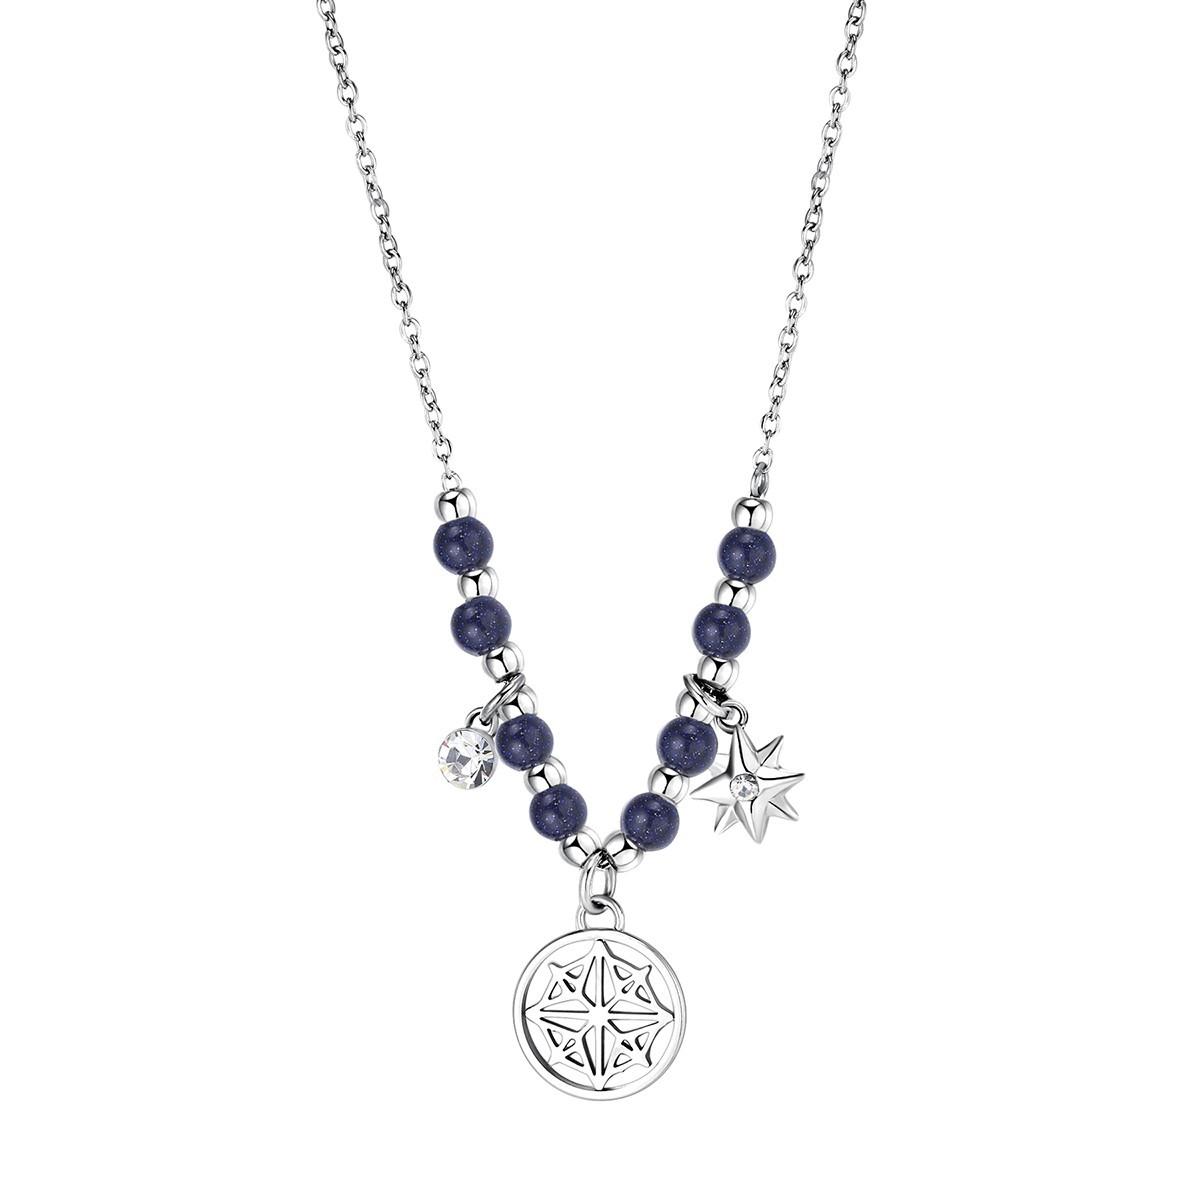 chakra new necklace